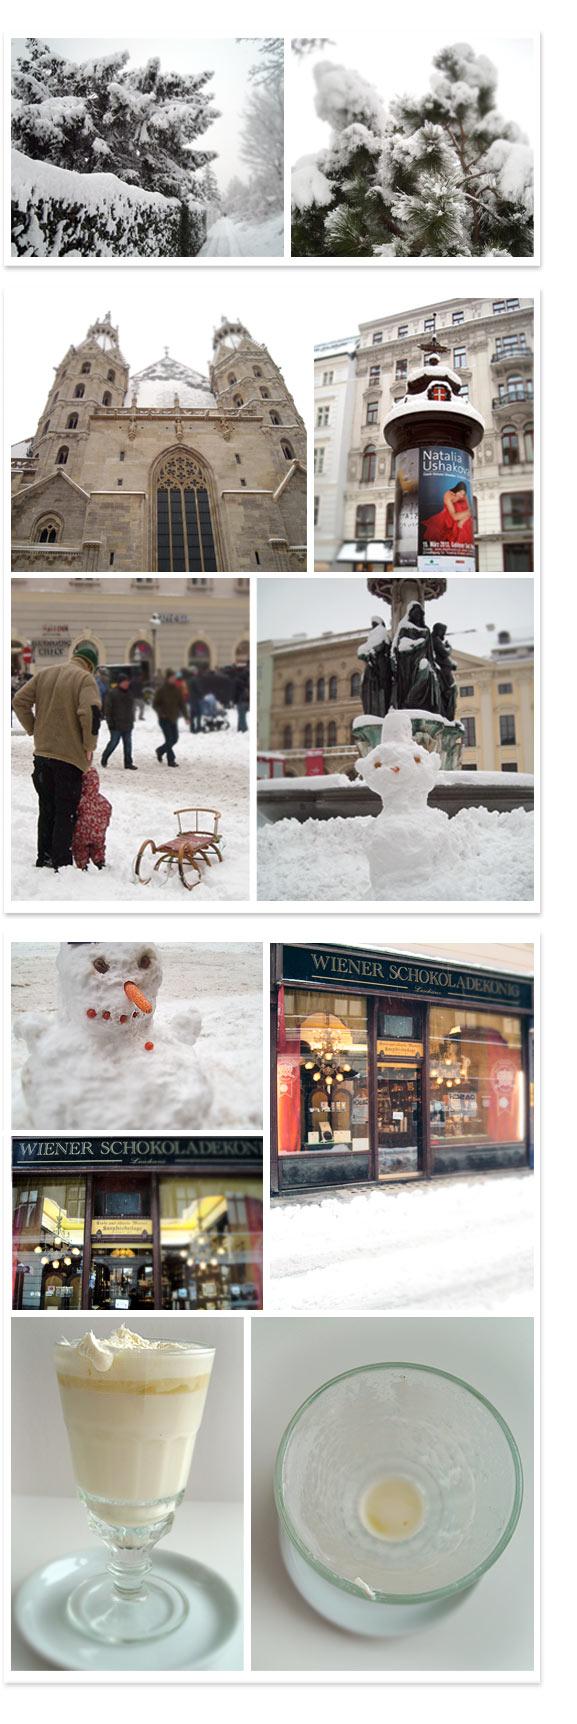 sonja-egger_wien-winter-stephansplatz-weisse-schokolade